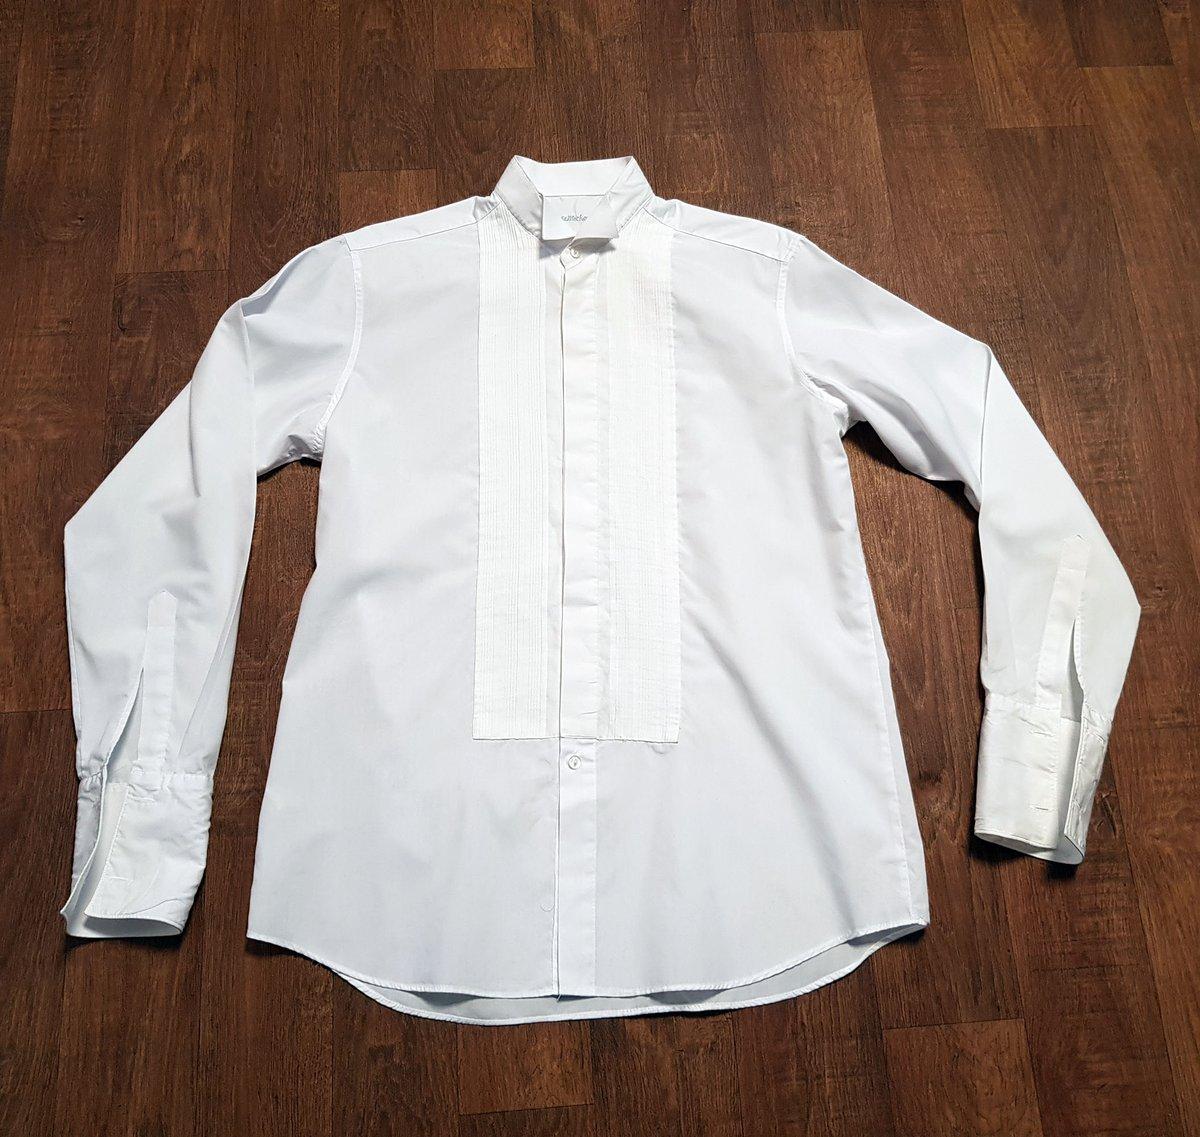 Mens Vintage White Wing Collar Dress Shirt UK Size Large  https://www.myvintage.uk/product-page/mens-vintage-white-wing-collar-dress-shirt-uk-size-large… #vintage #retro #1970s #dressshirt #mensshirt #mensclothing #Mensfashion #mensstyle #menstyle #formaldress #formalshirtpic.twitter.com/kvBhbAxvgh